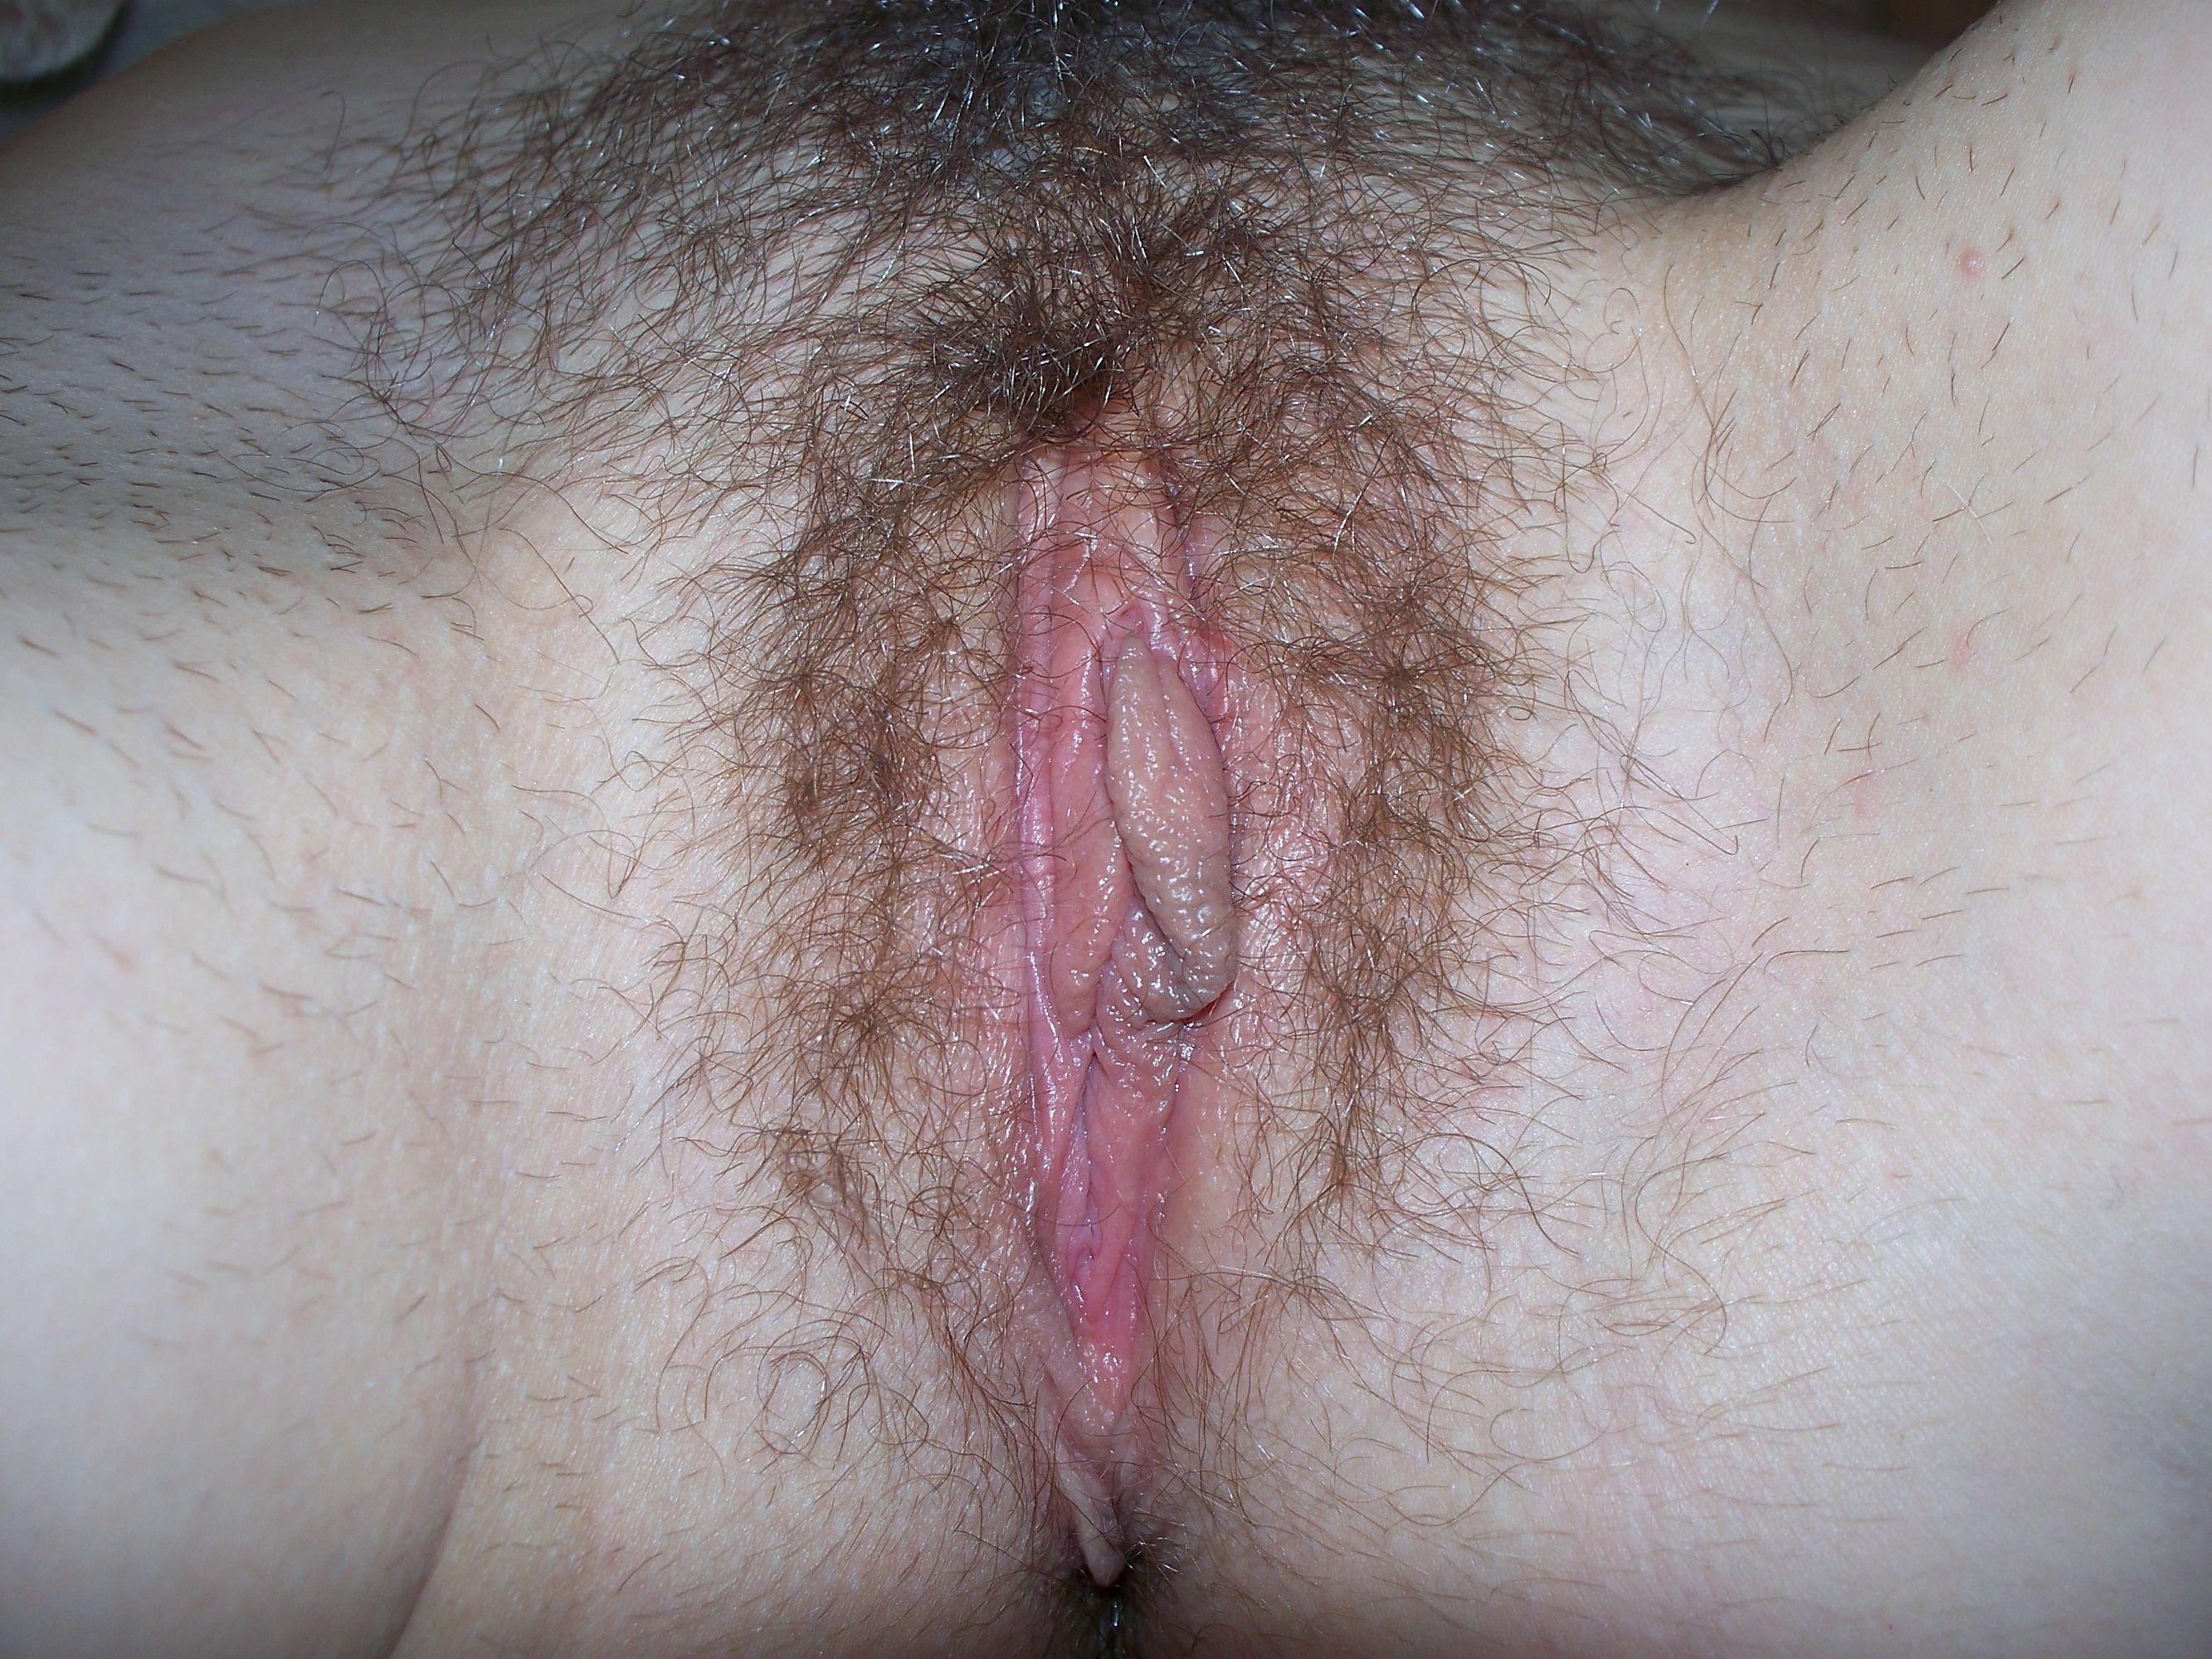 www knulla knula fita homosexuell